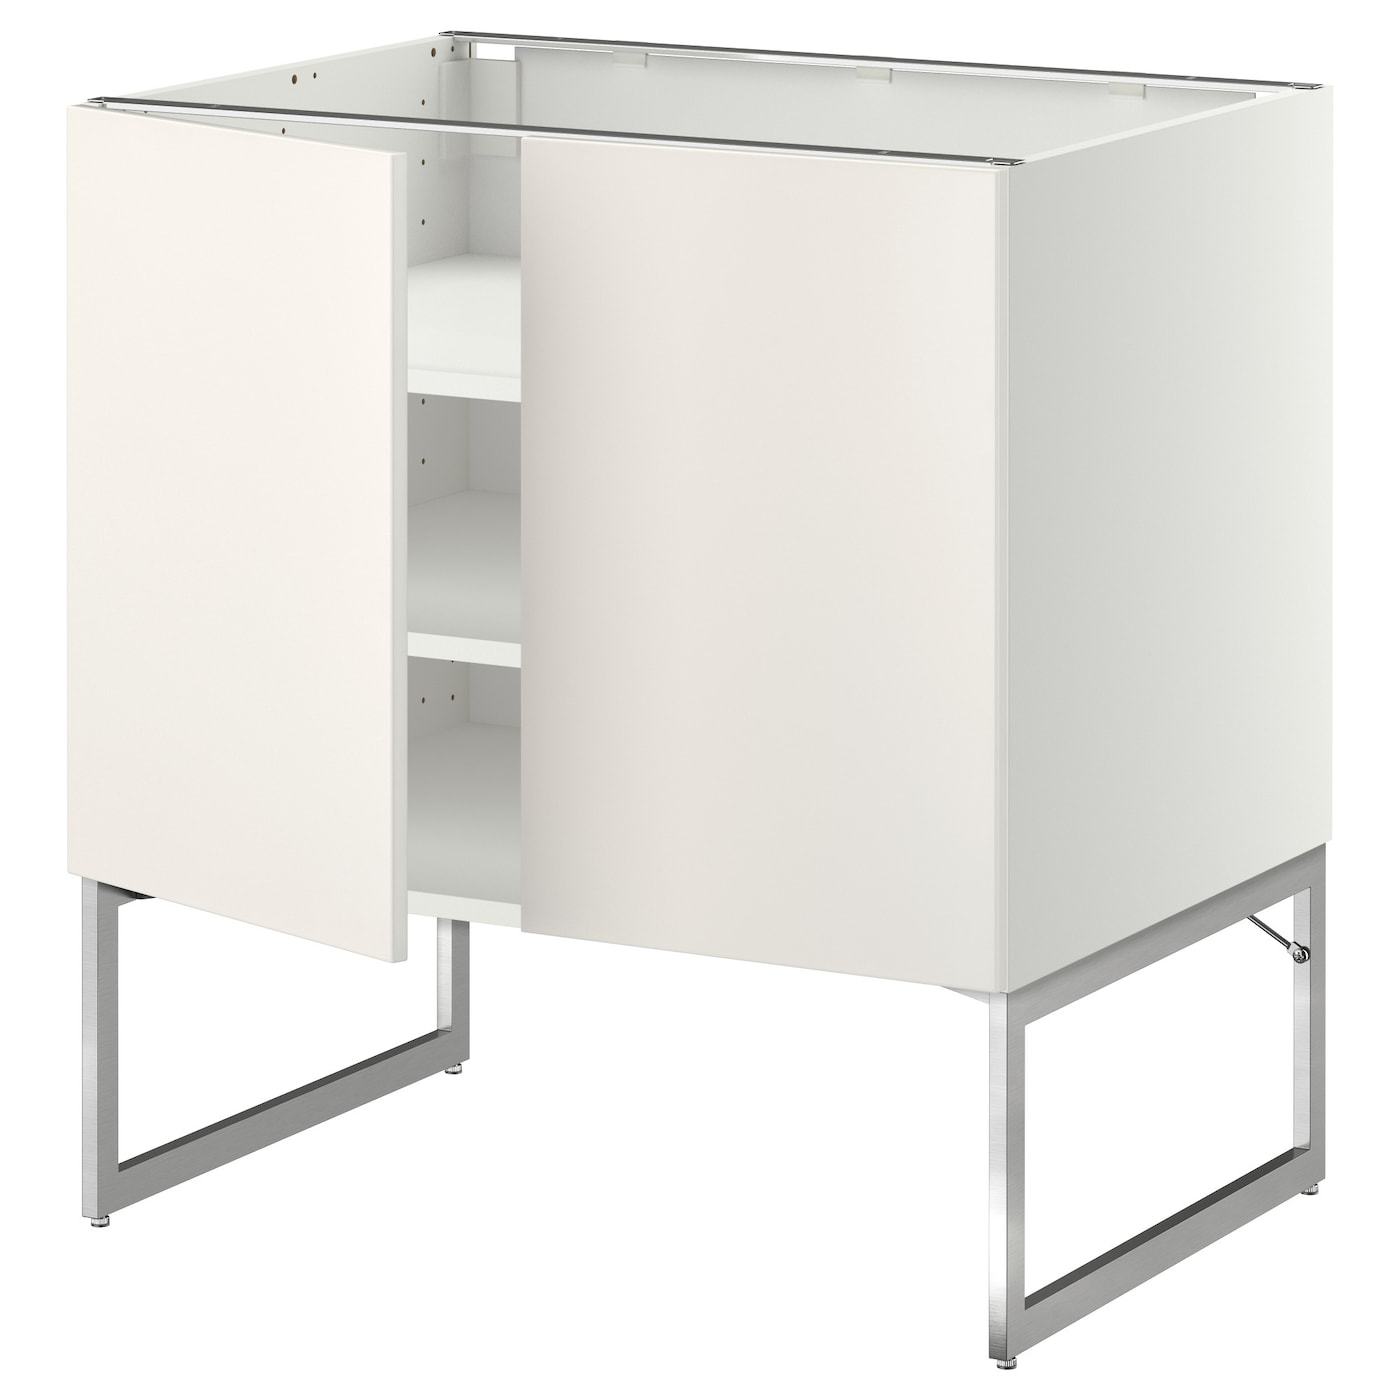 metod base cabinet with shelves 2 doors white veddinge white 80x60x60 cm ikea. Black Bedroom Furniture Sets. Home Design Ideas